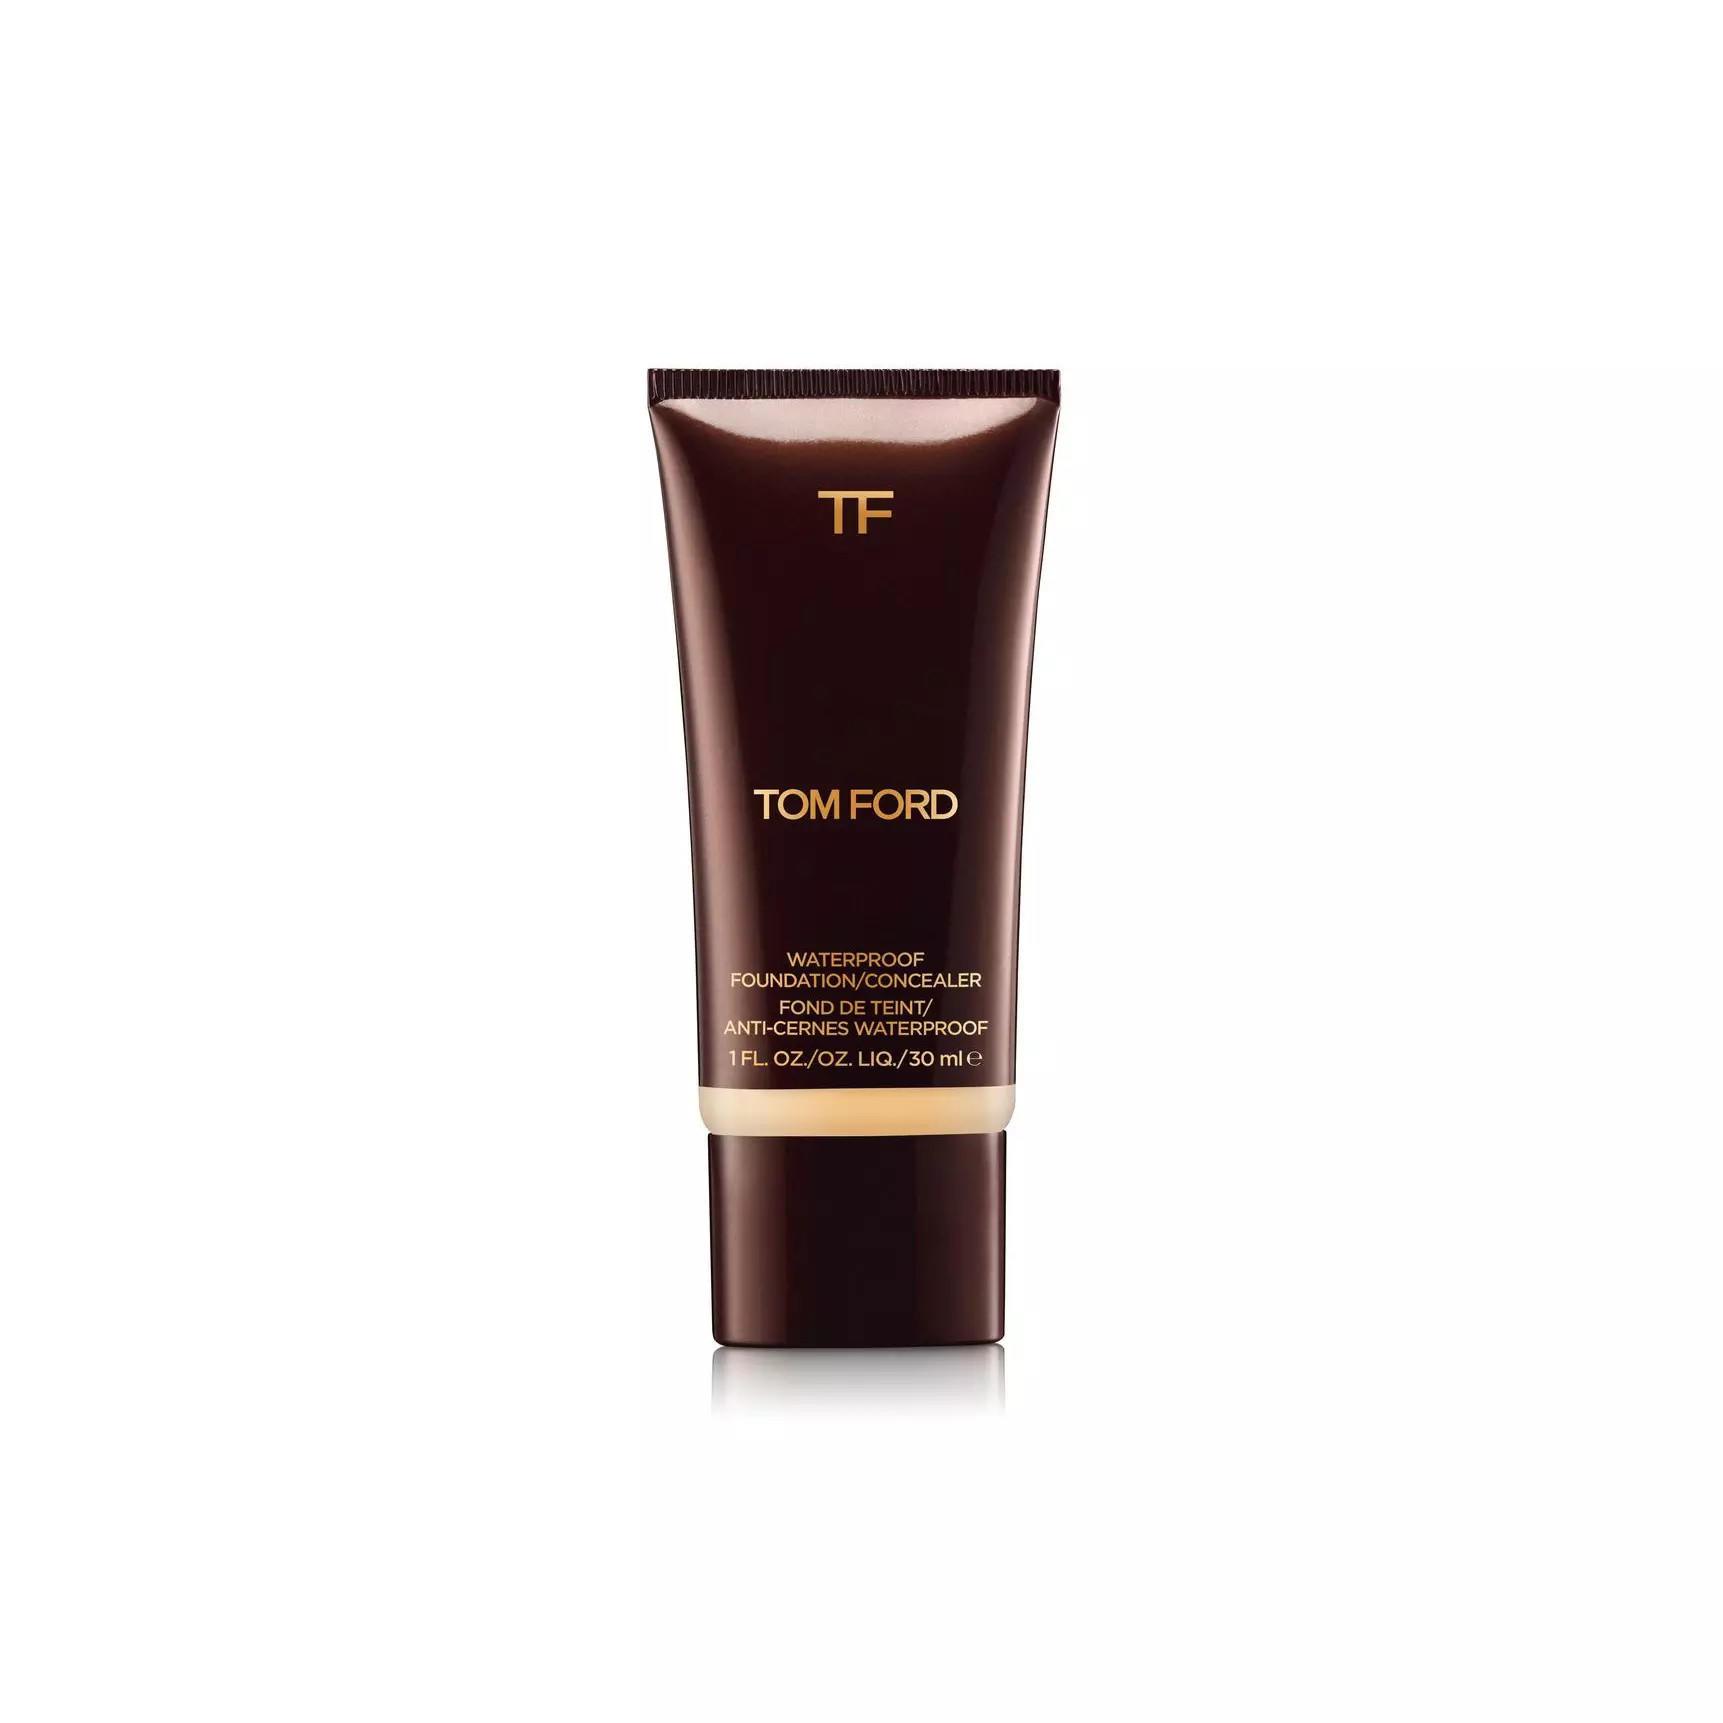 Tom Ford Waterproof Foundation/Concealer Ivory 4.5